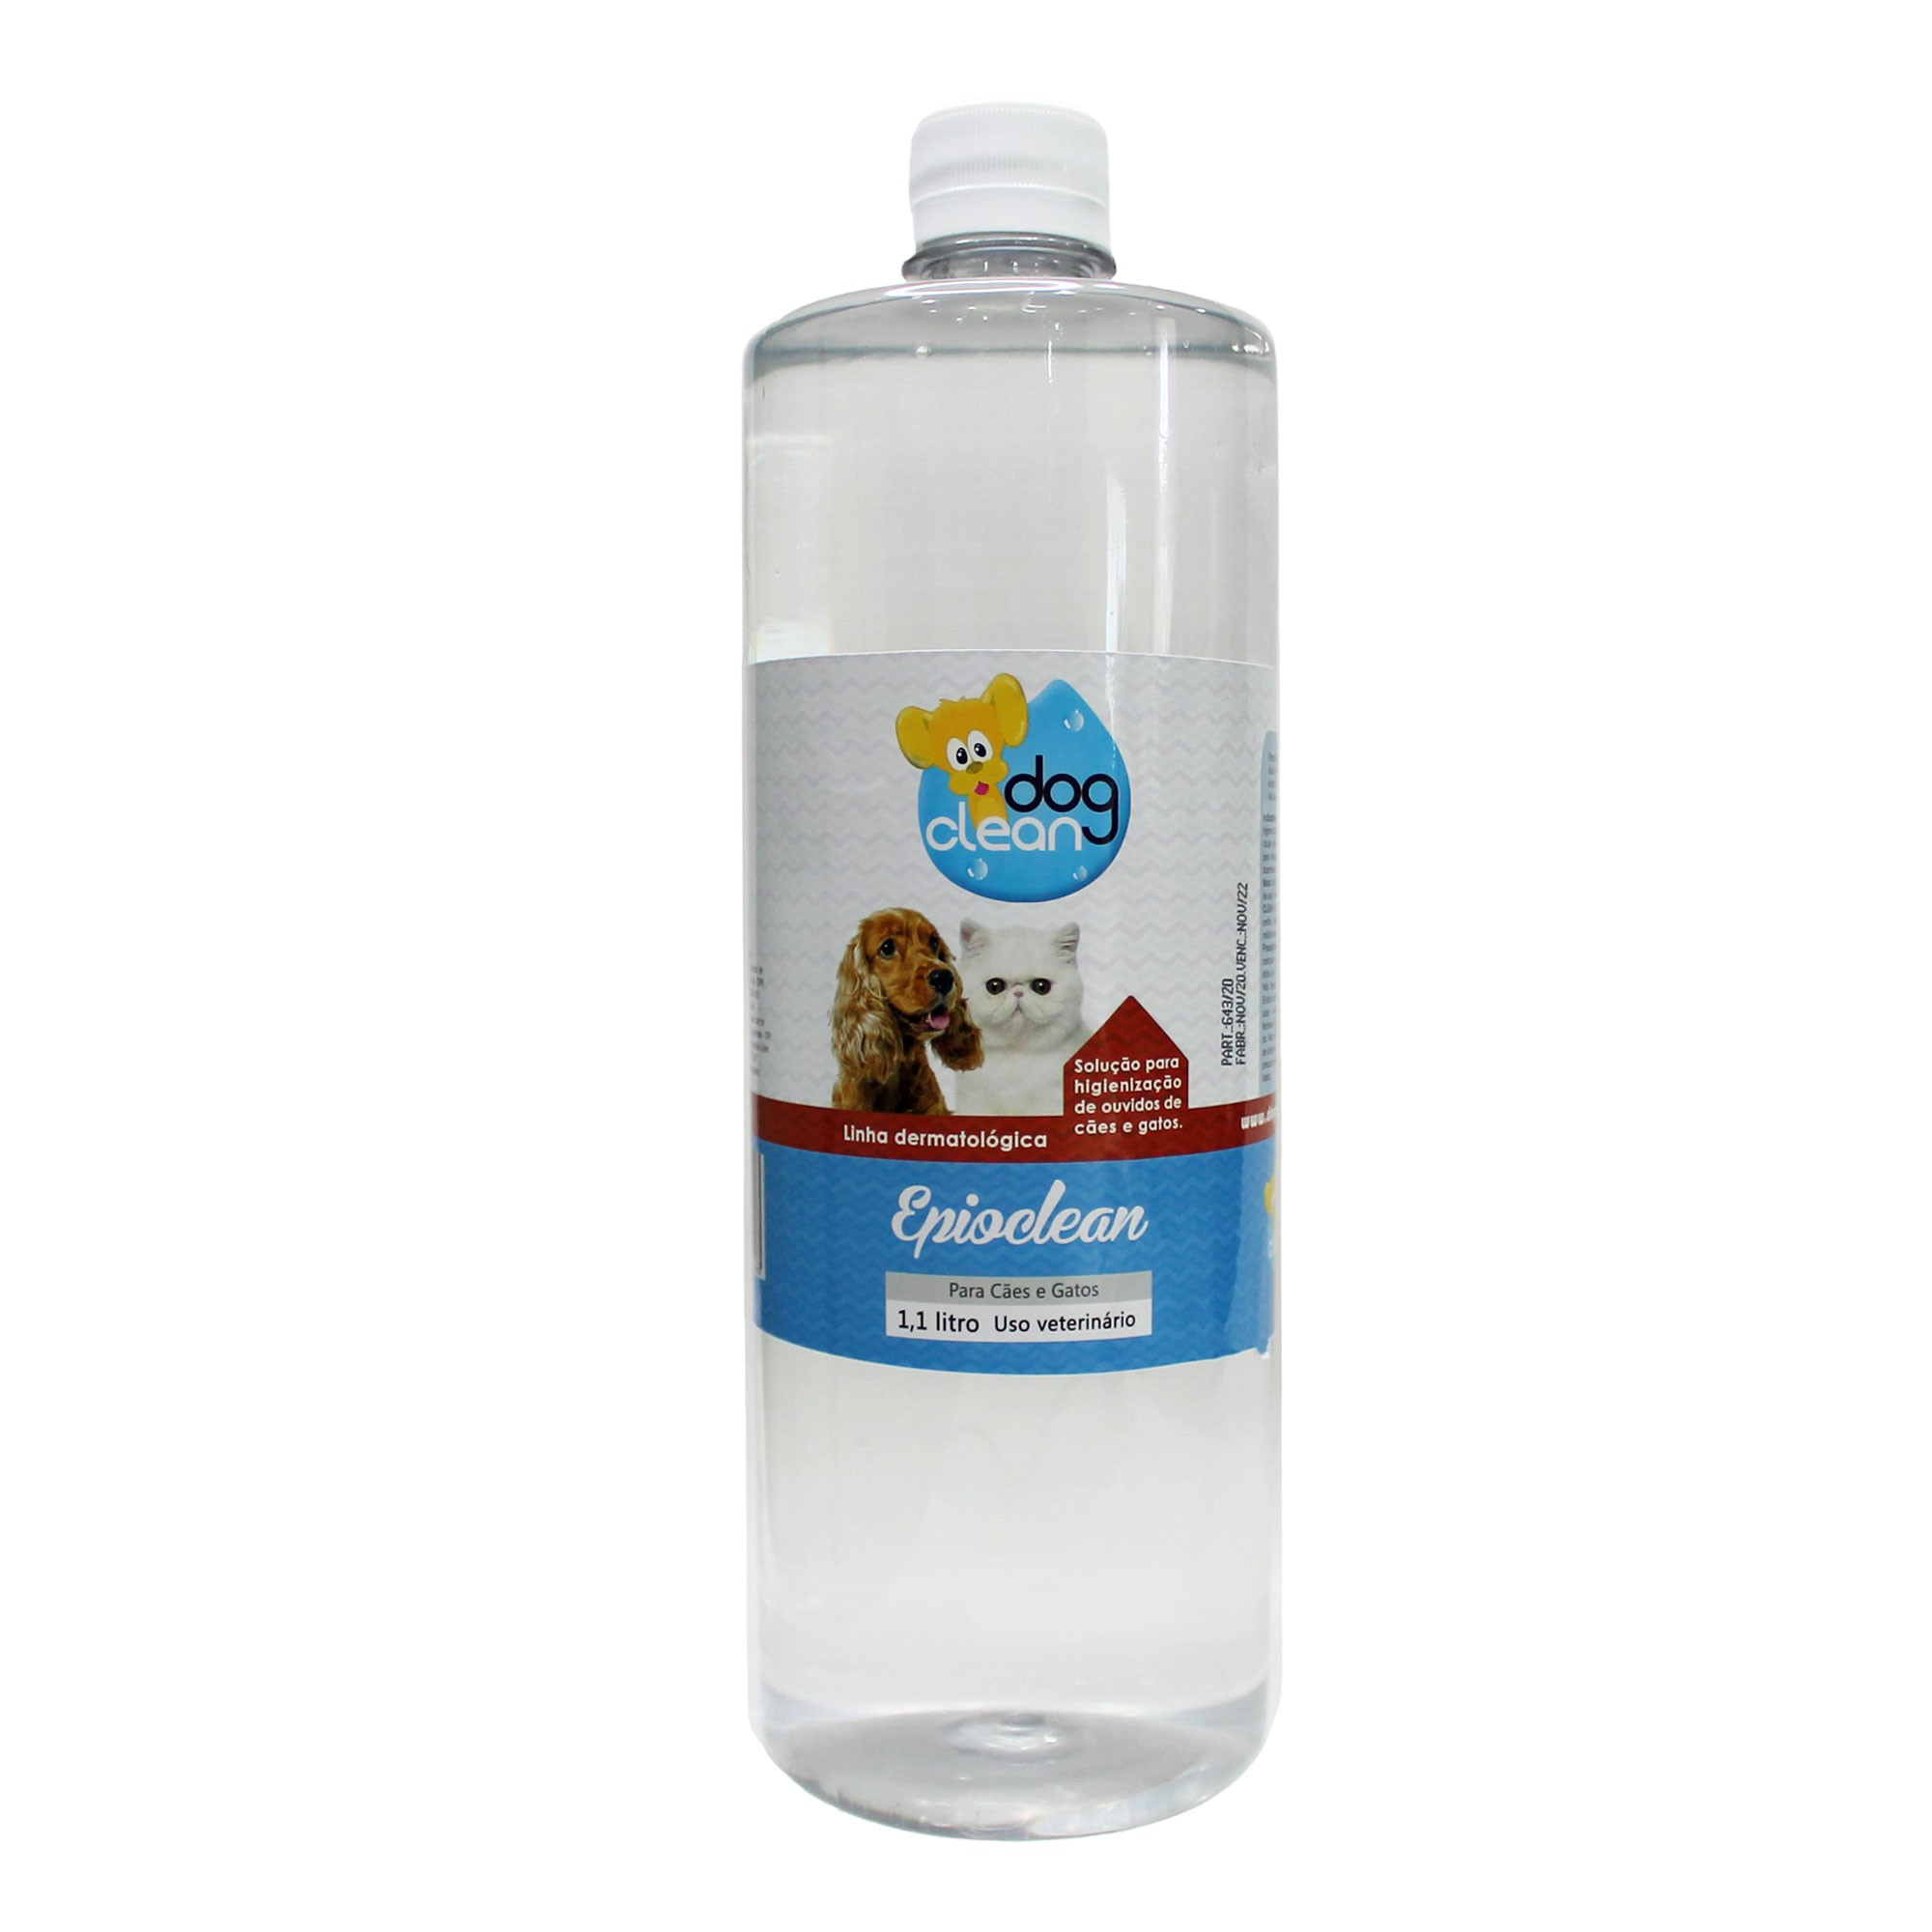 Epioclean Refil 1.1 Litros Dog Clean